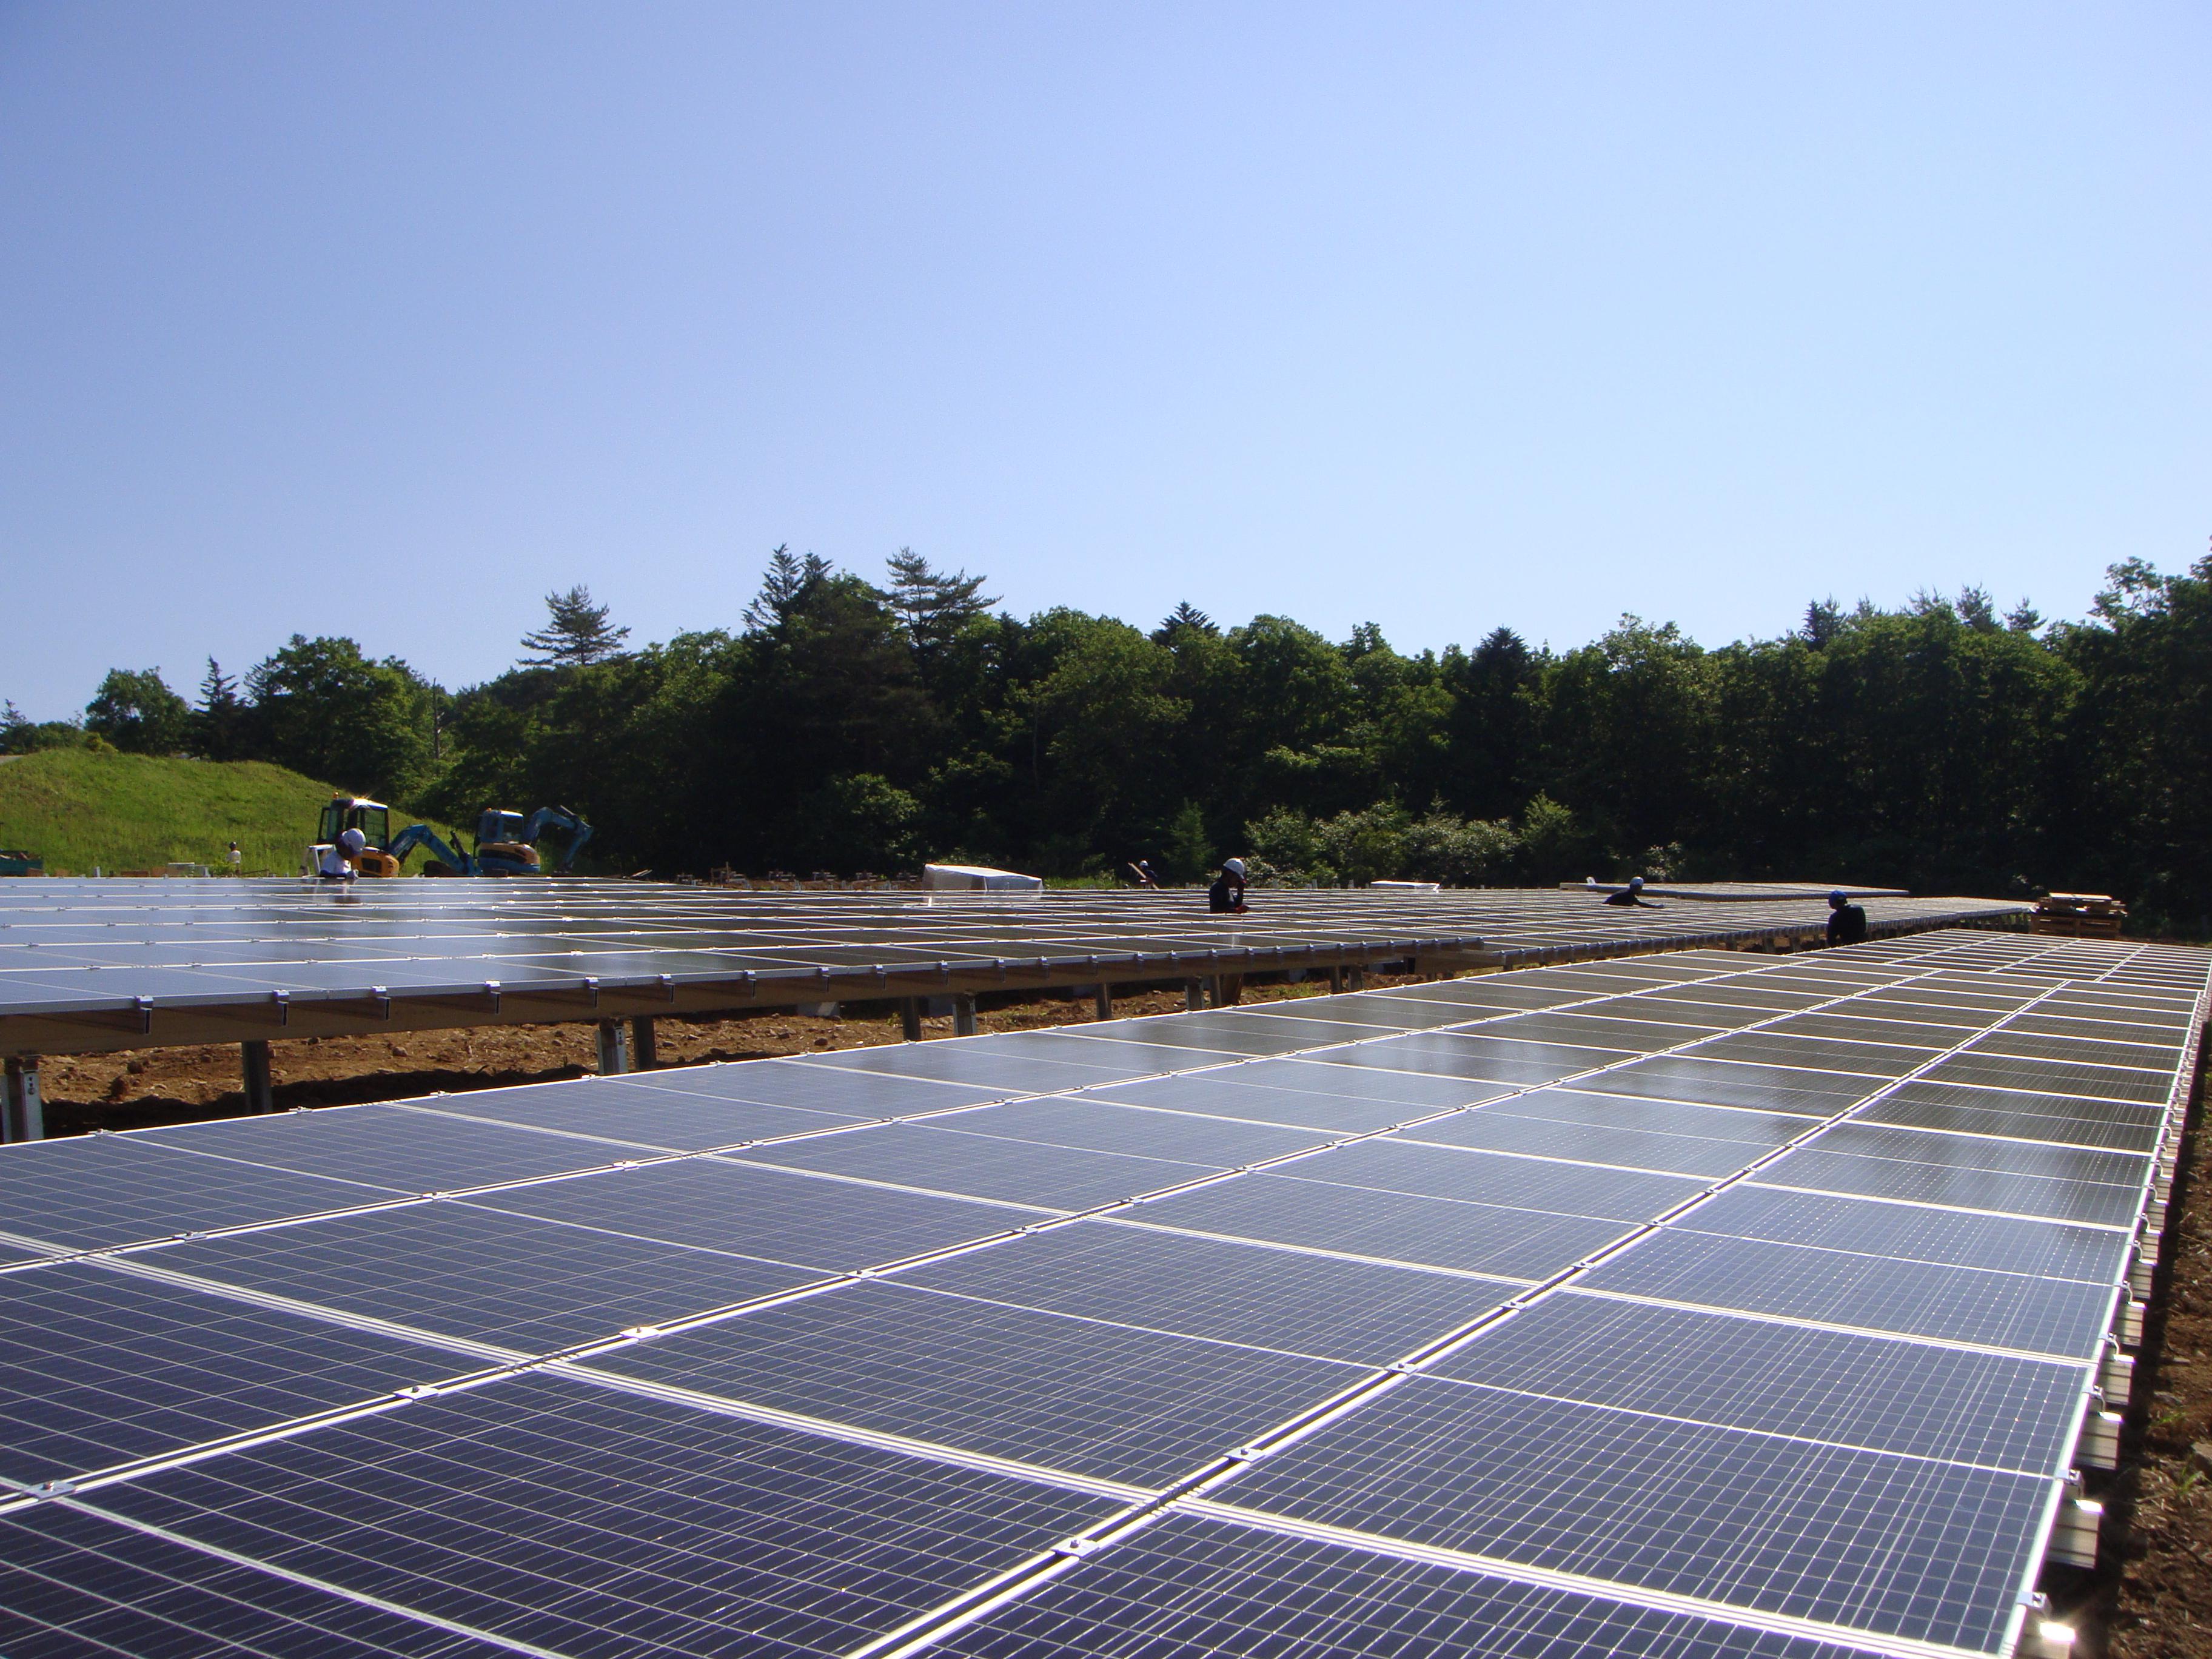 【東京都世田谷区】太陽光発電設備の導入・設置に伴う施工管理